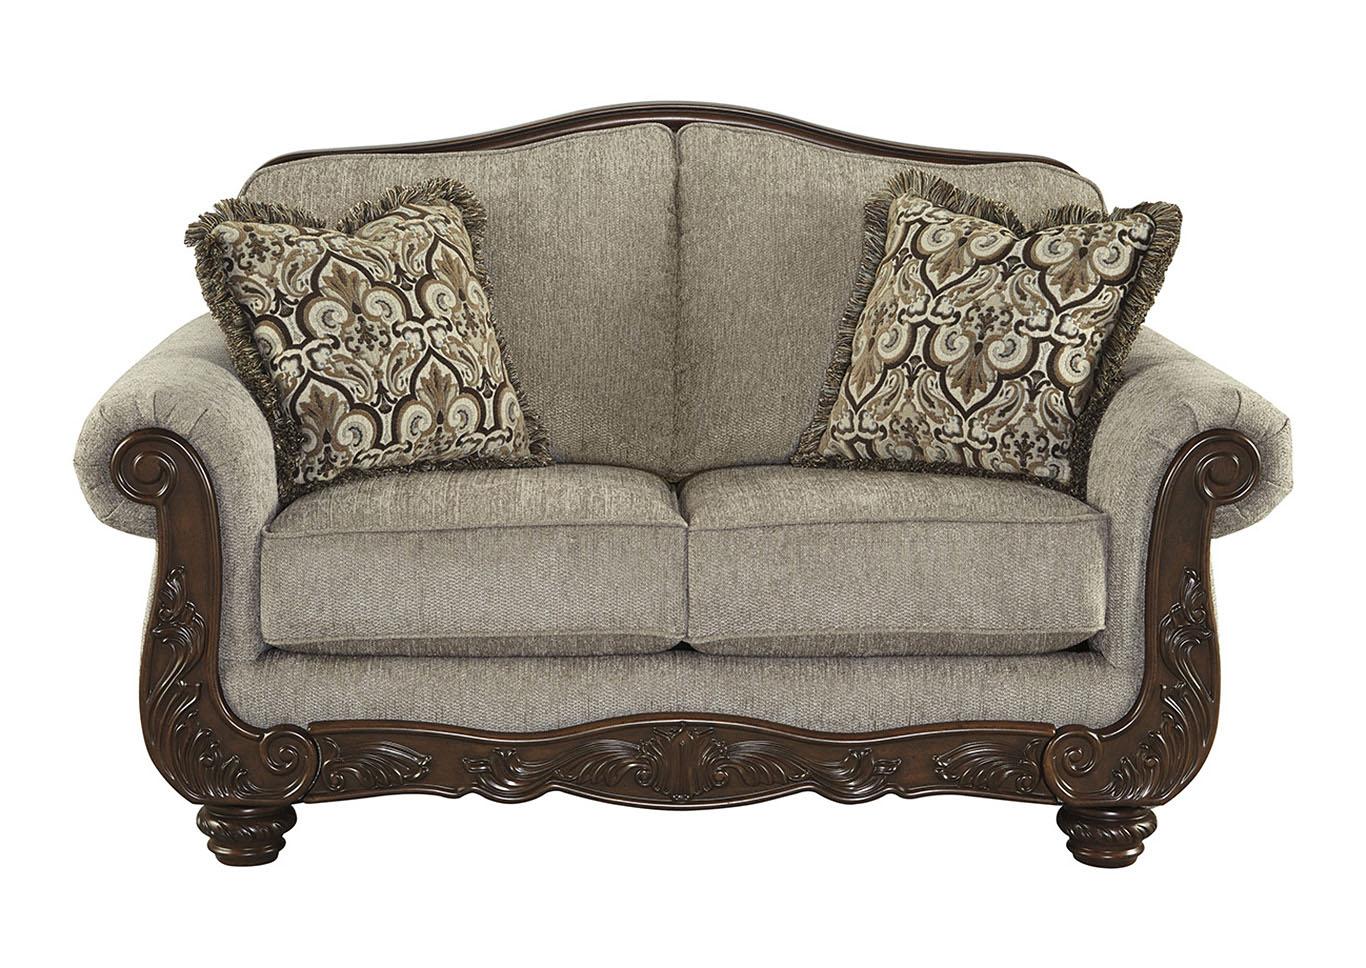 Majek Furniture Cecilyn Cocoa Loveseat